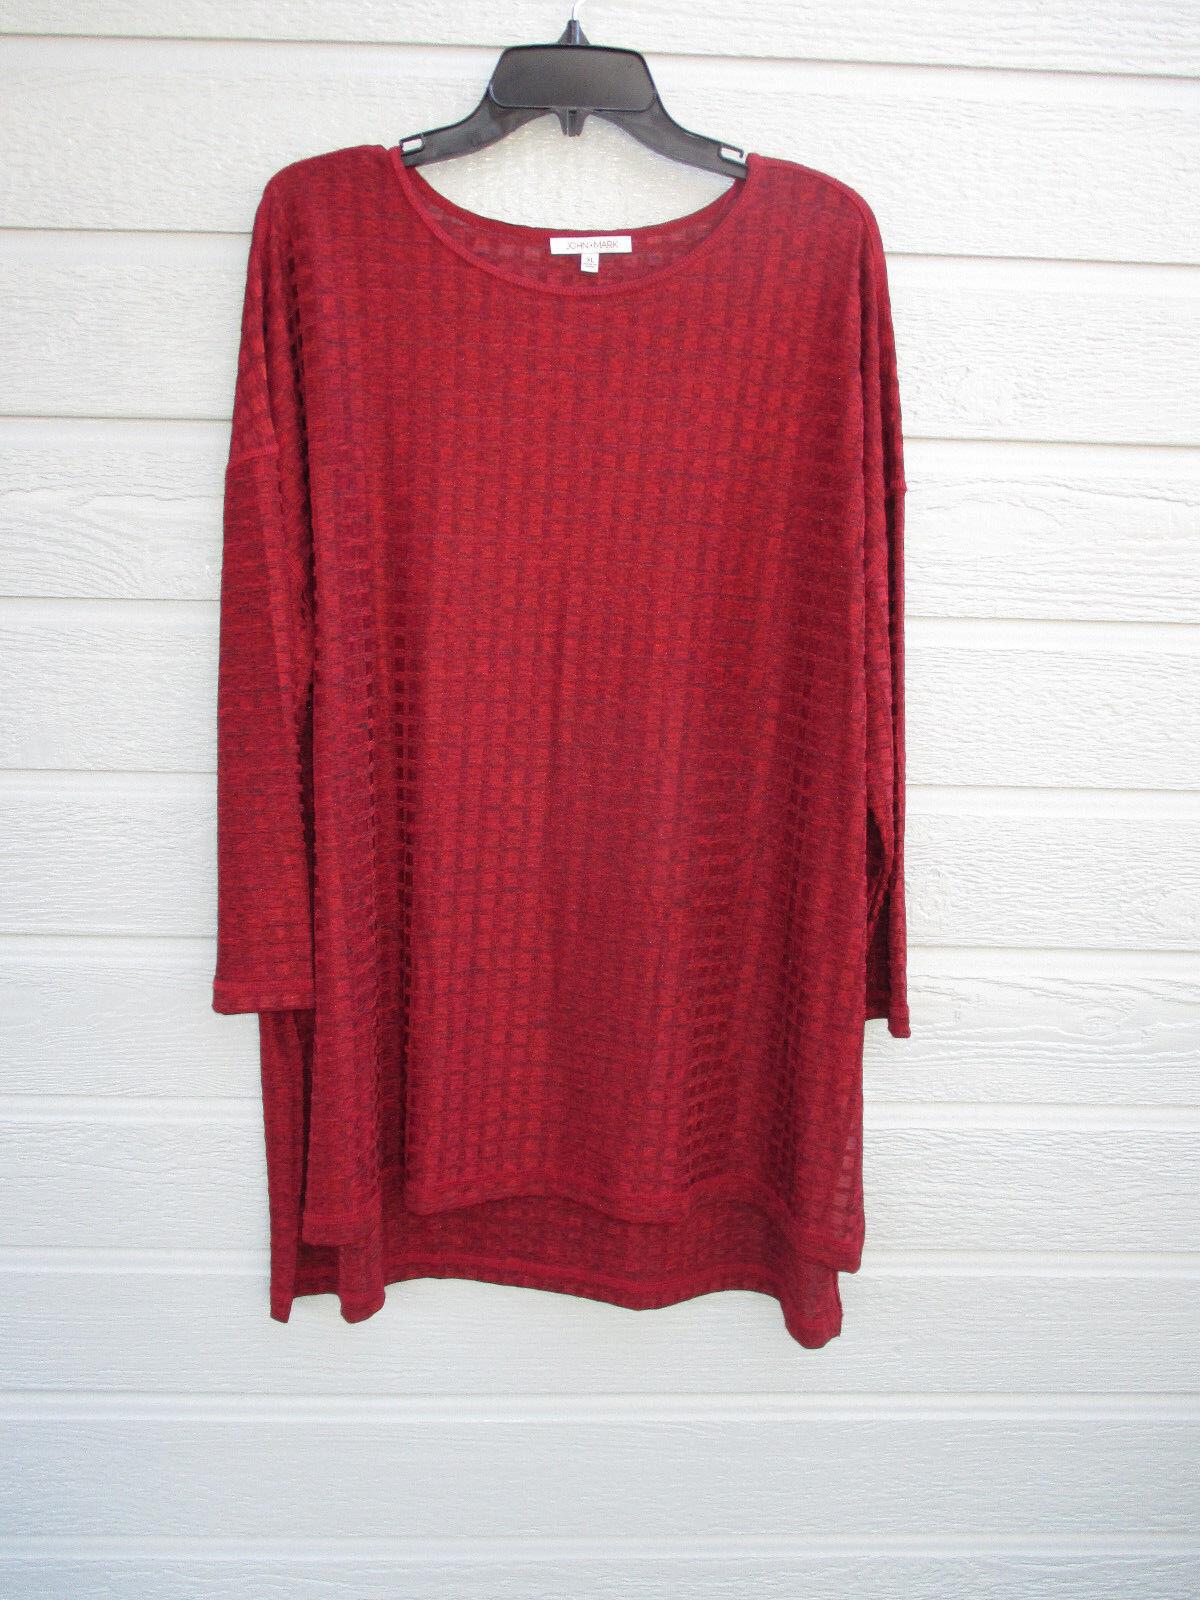 NWT John Mark women's 3 4 sleeve Red semi sheer knit Hi-Lo tunic top SZ XL